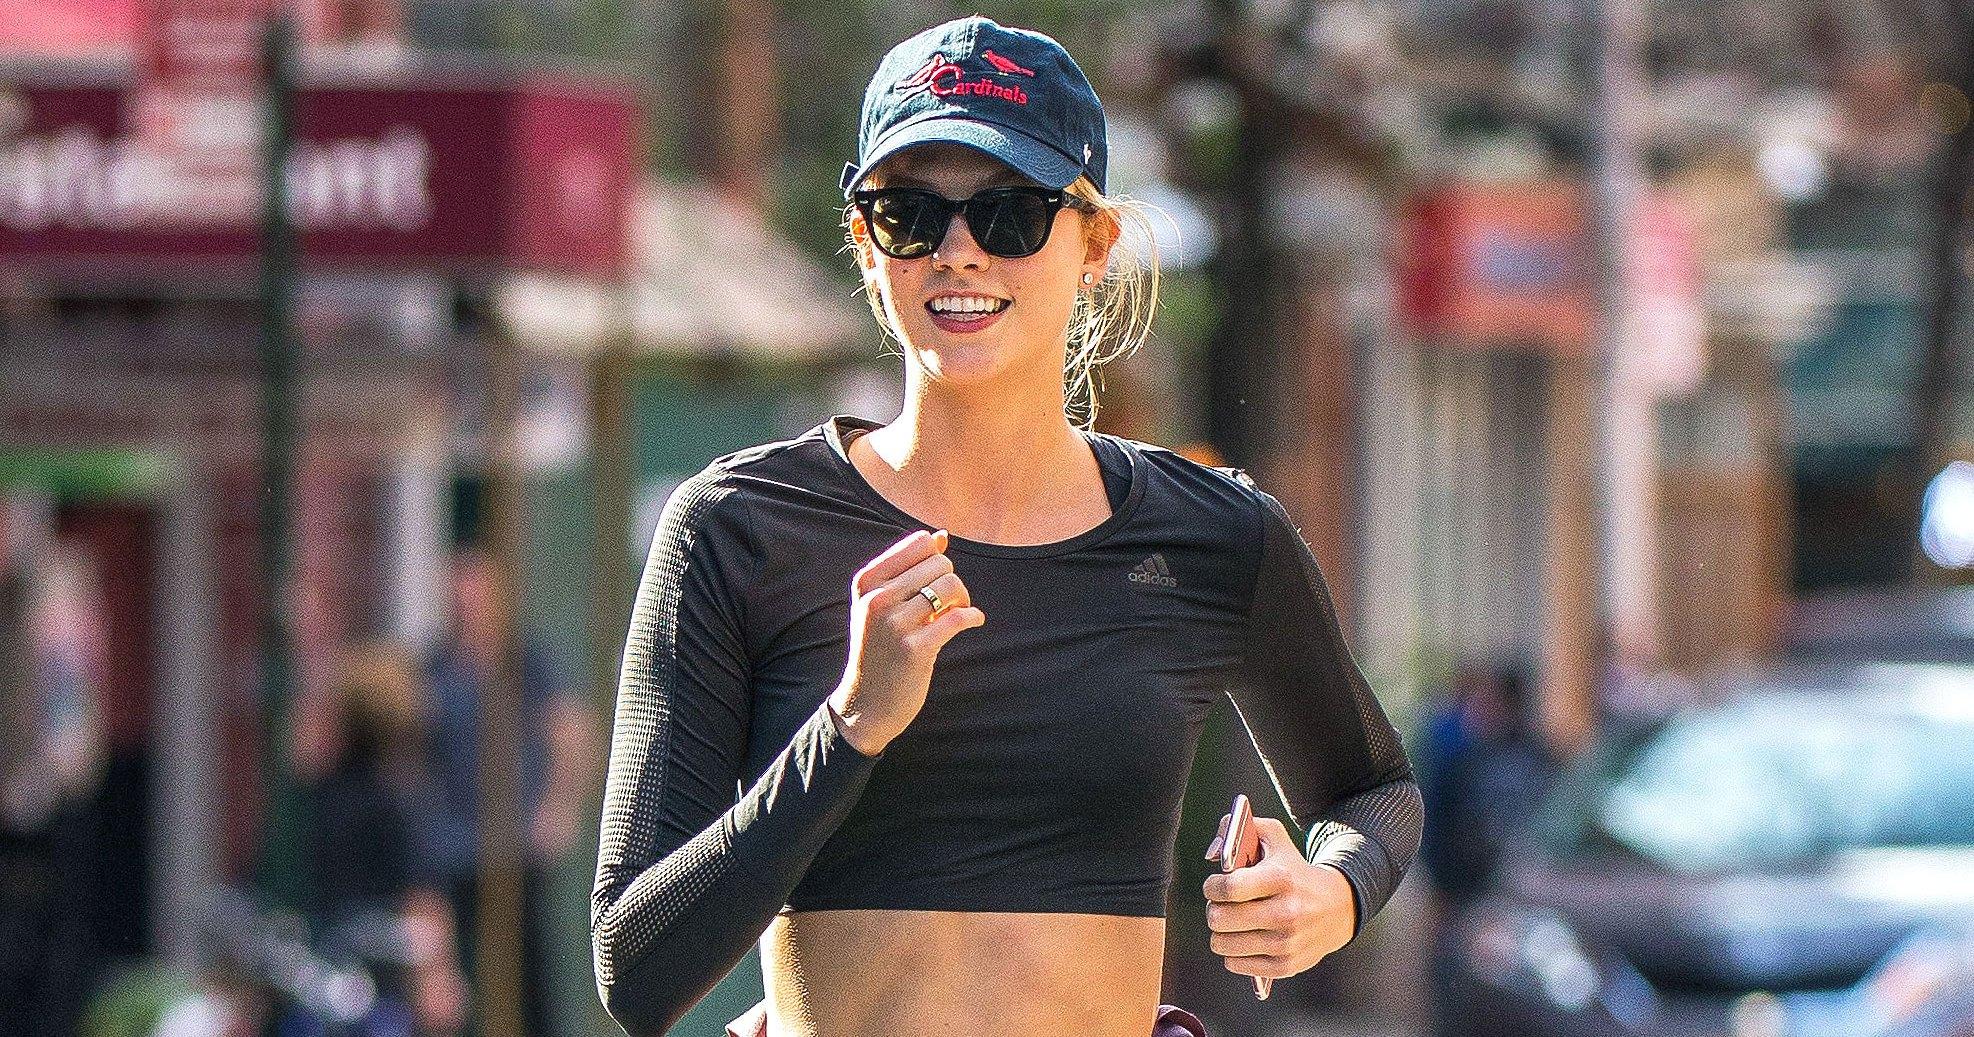 Best Celebrity Diet Tricks: Nutrition Secrets That Give Jennifer Garner, Jessica Alba, More Their Hot Bodies